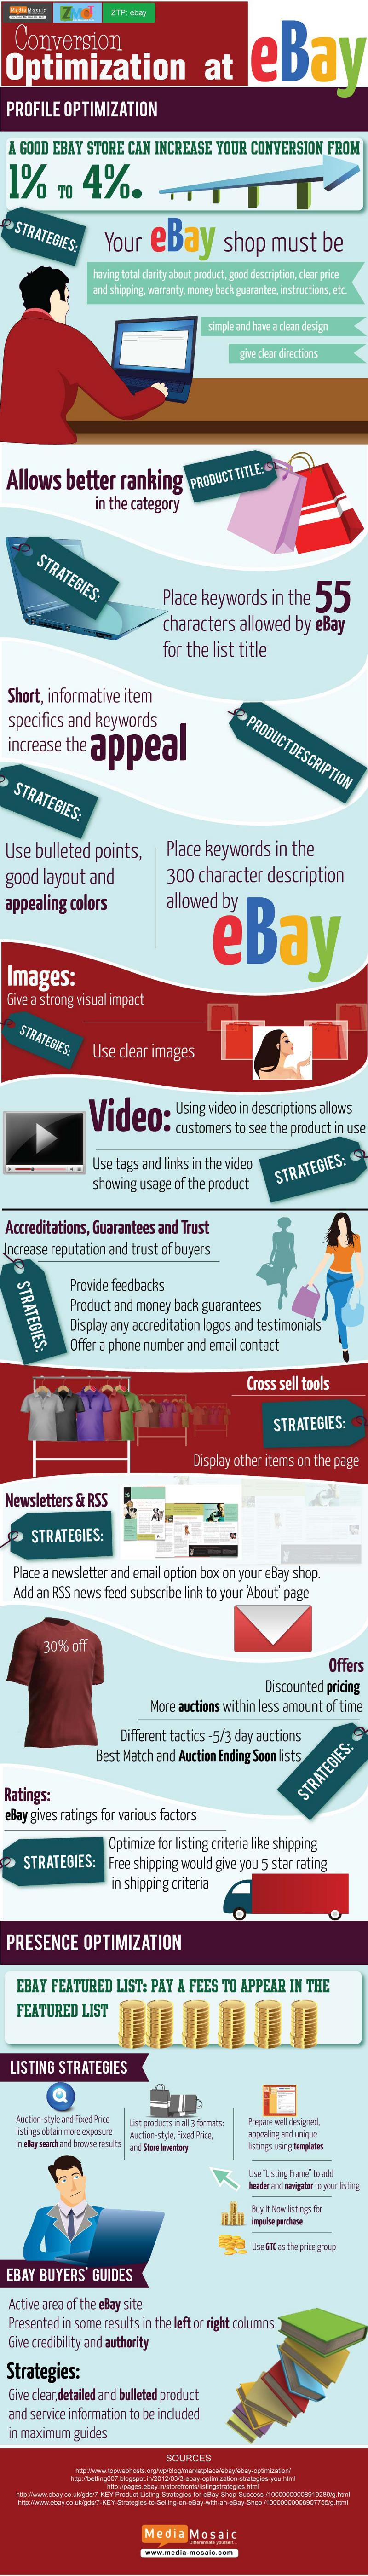 Selling-Optimization-Strategies